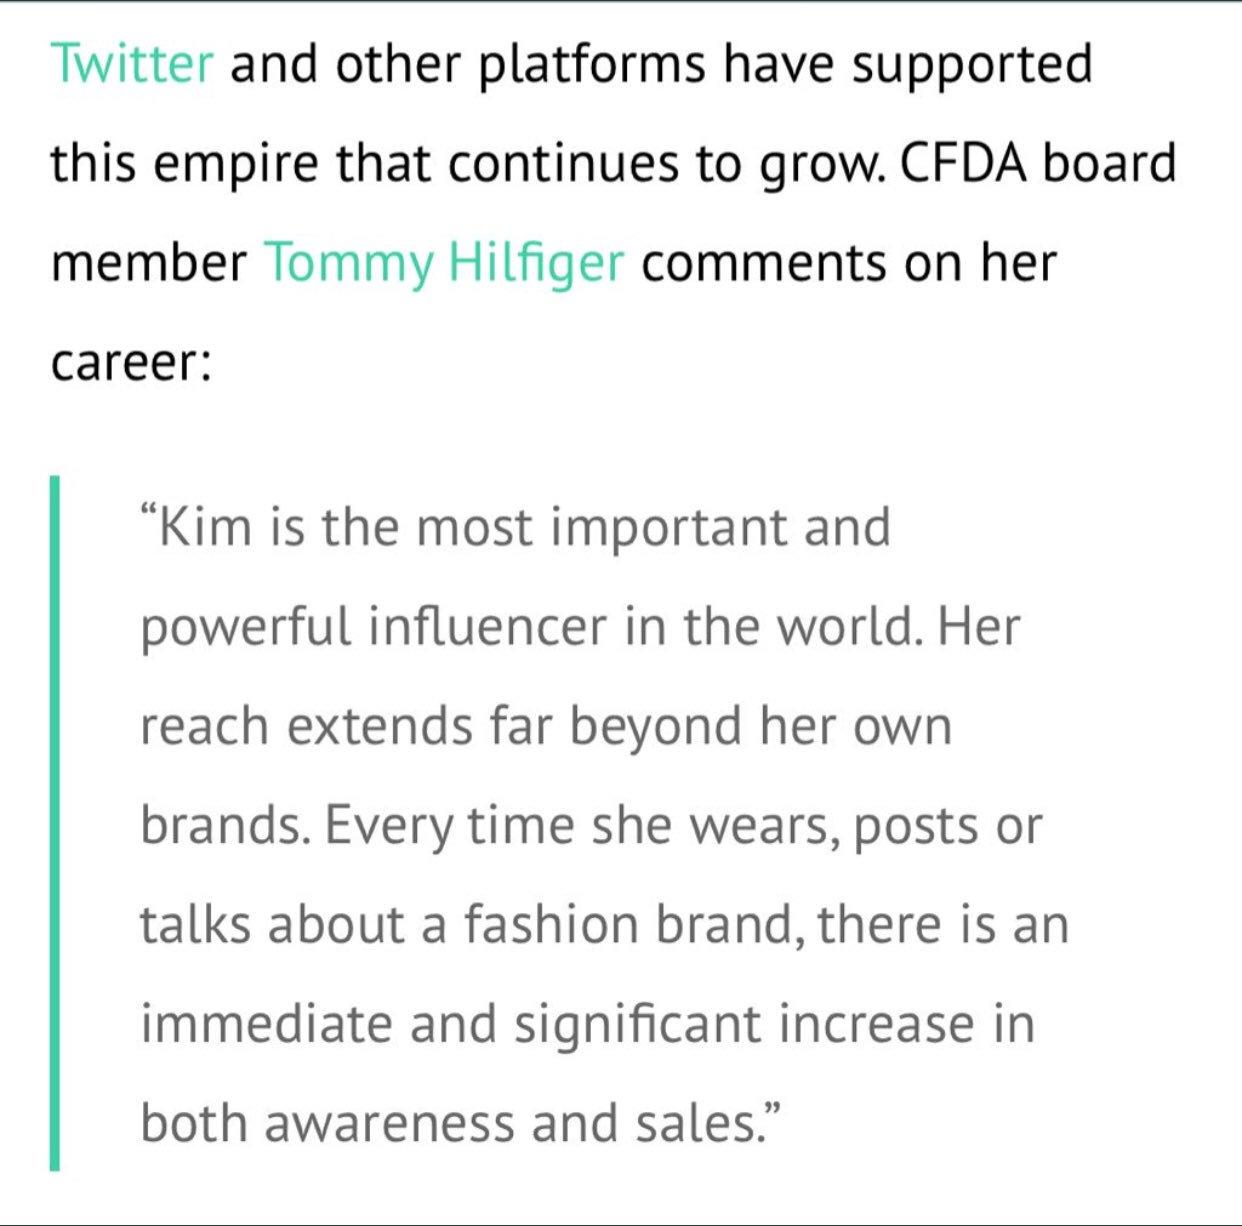 I love you @TommyHilfiger Thank you for your kind words ❤️ https://t.co/VDT7gi0Igr